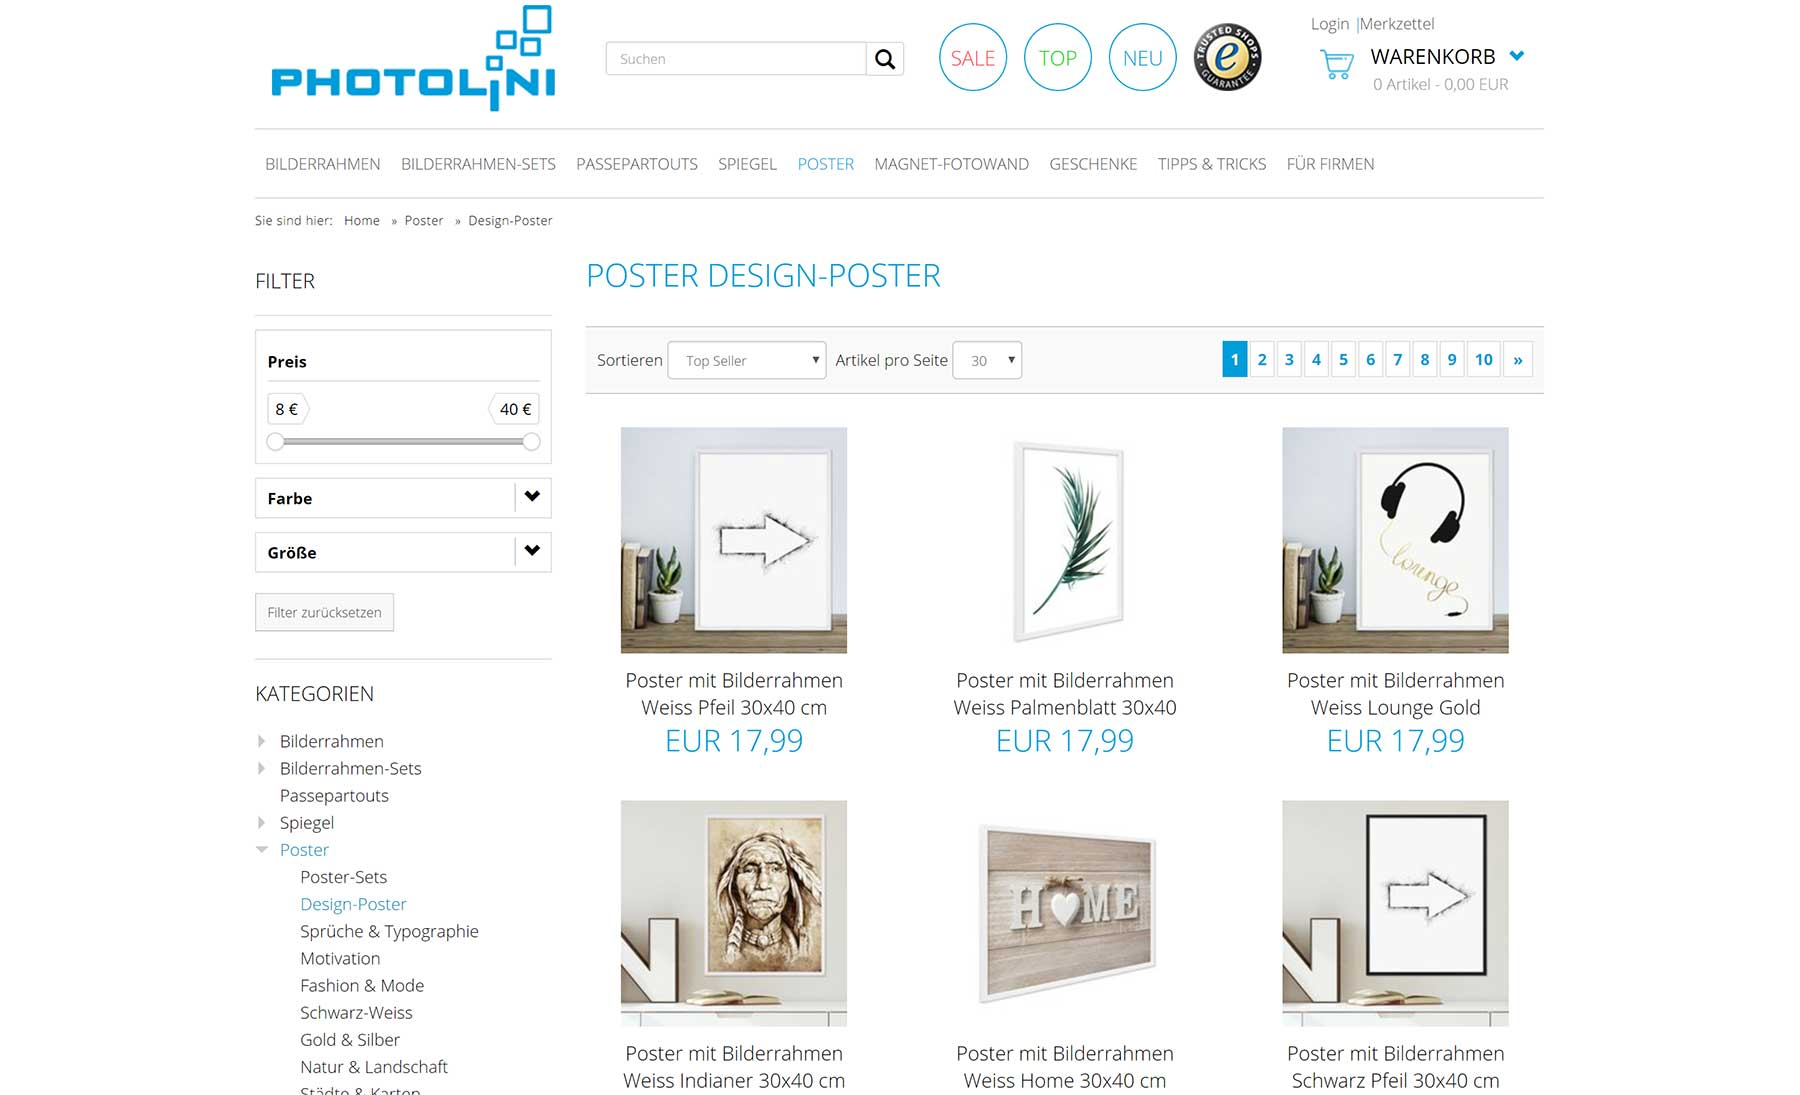 Design-Poster mit Rahmen von Photolini Photolini-Test_17